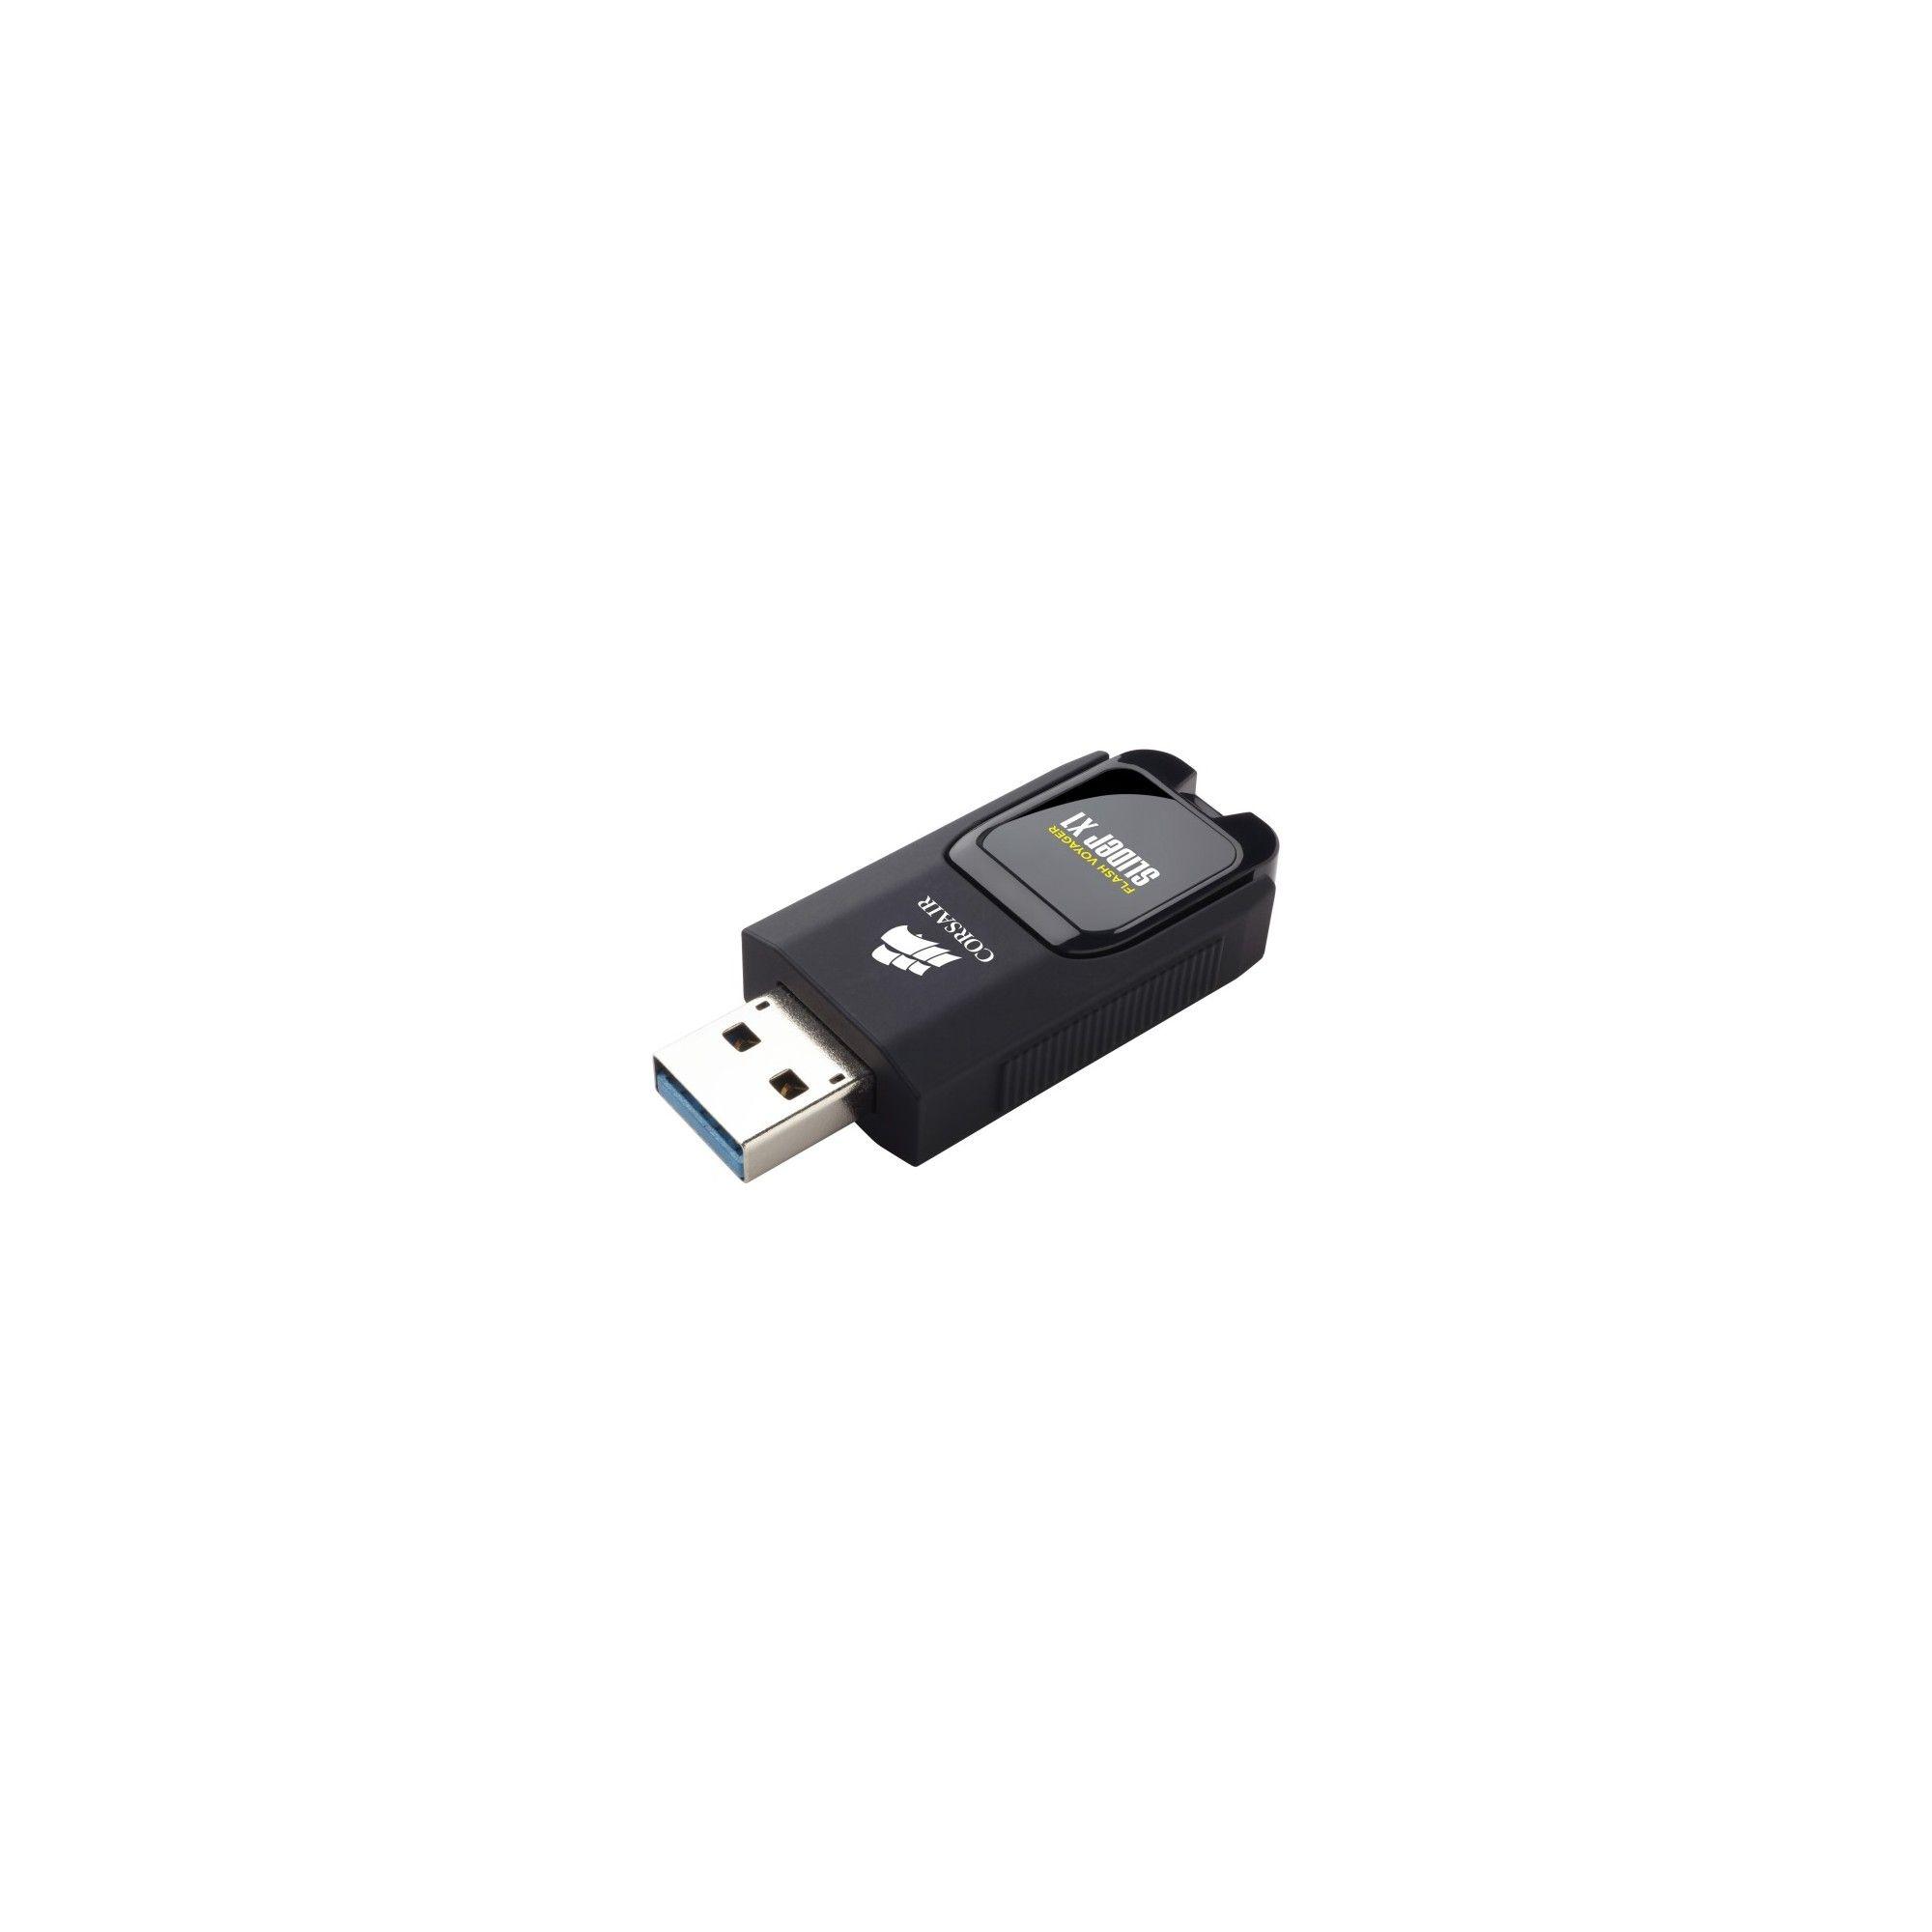 Corsair Flash Voyager Slider X1 64GB USB 3.0 Flash Drive